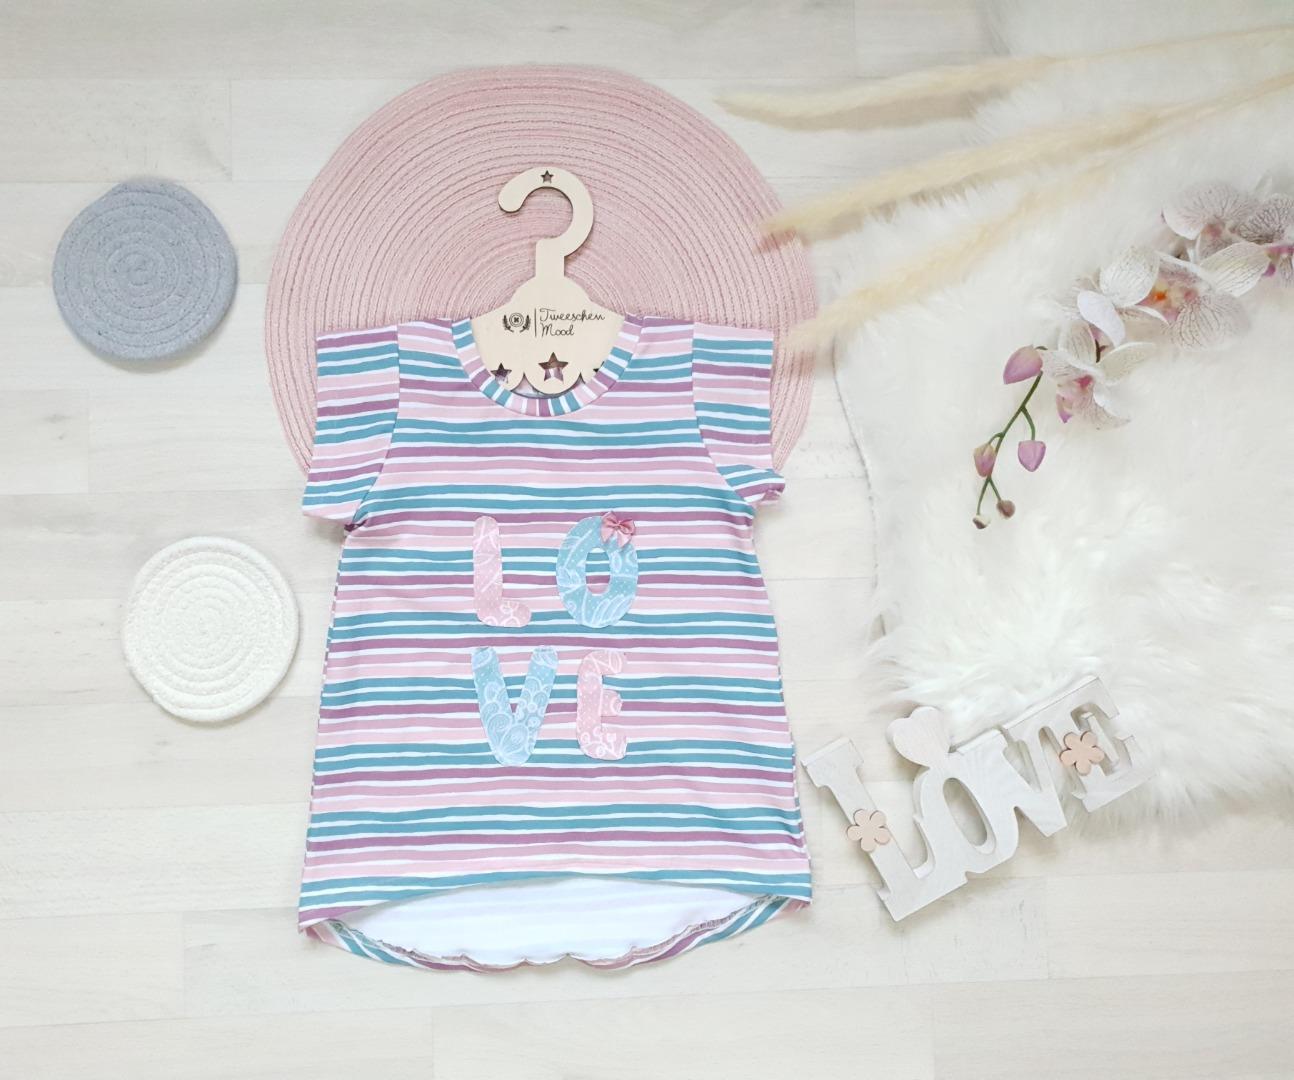 Sofortkauf Handmade Cutieshirt LOVE Gr Tweeschen